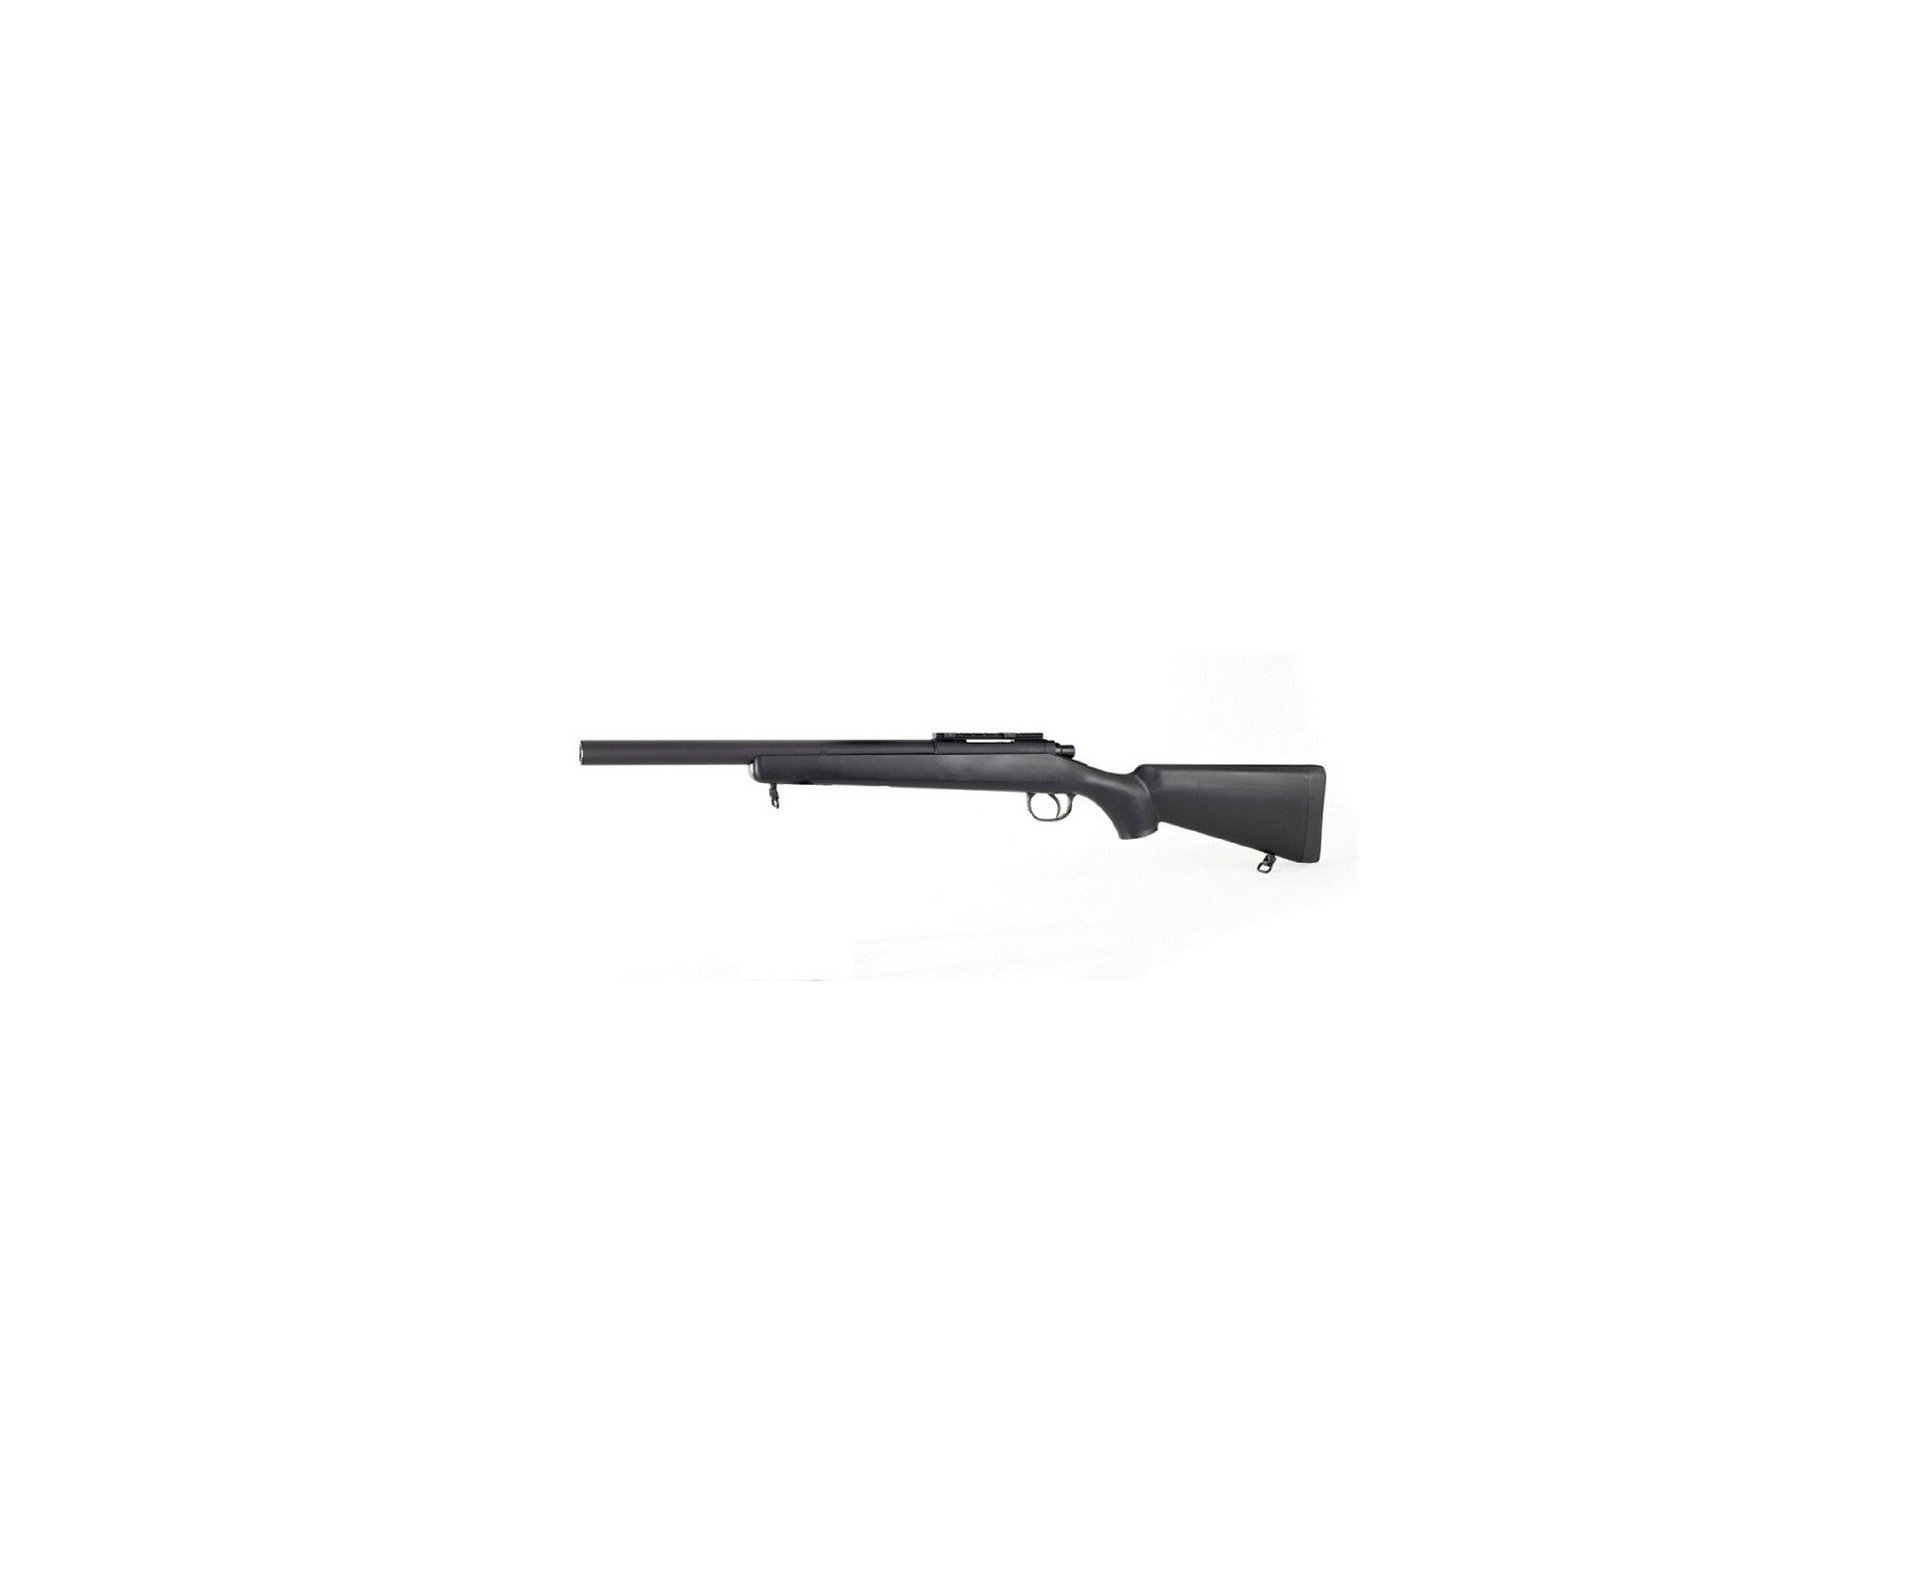 Rifle De Airsoft Sniper Sar10 - Spring - Cal 6.0 Mm - Swiss+ Arms